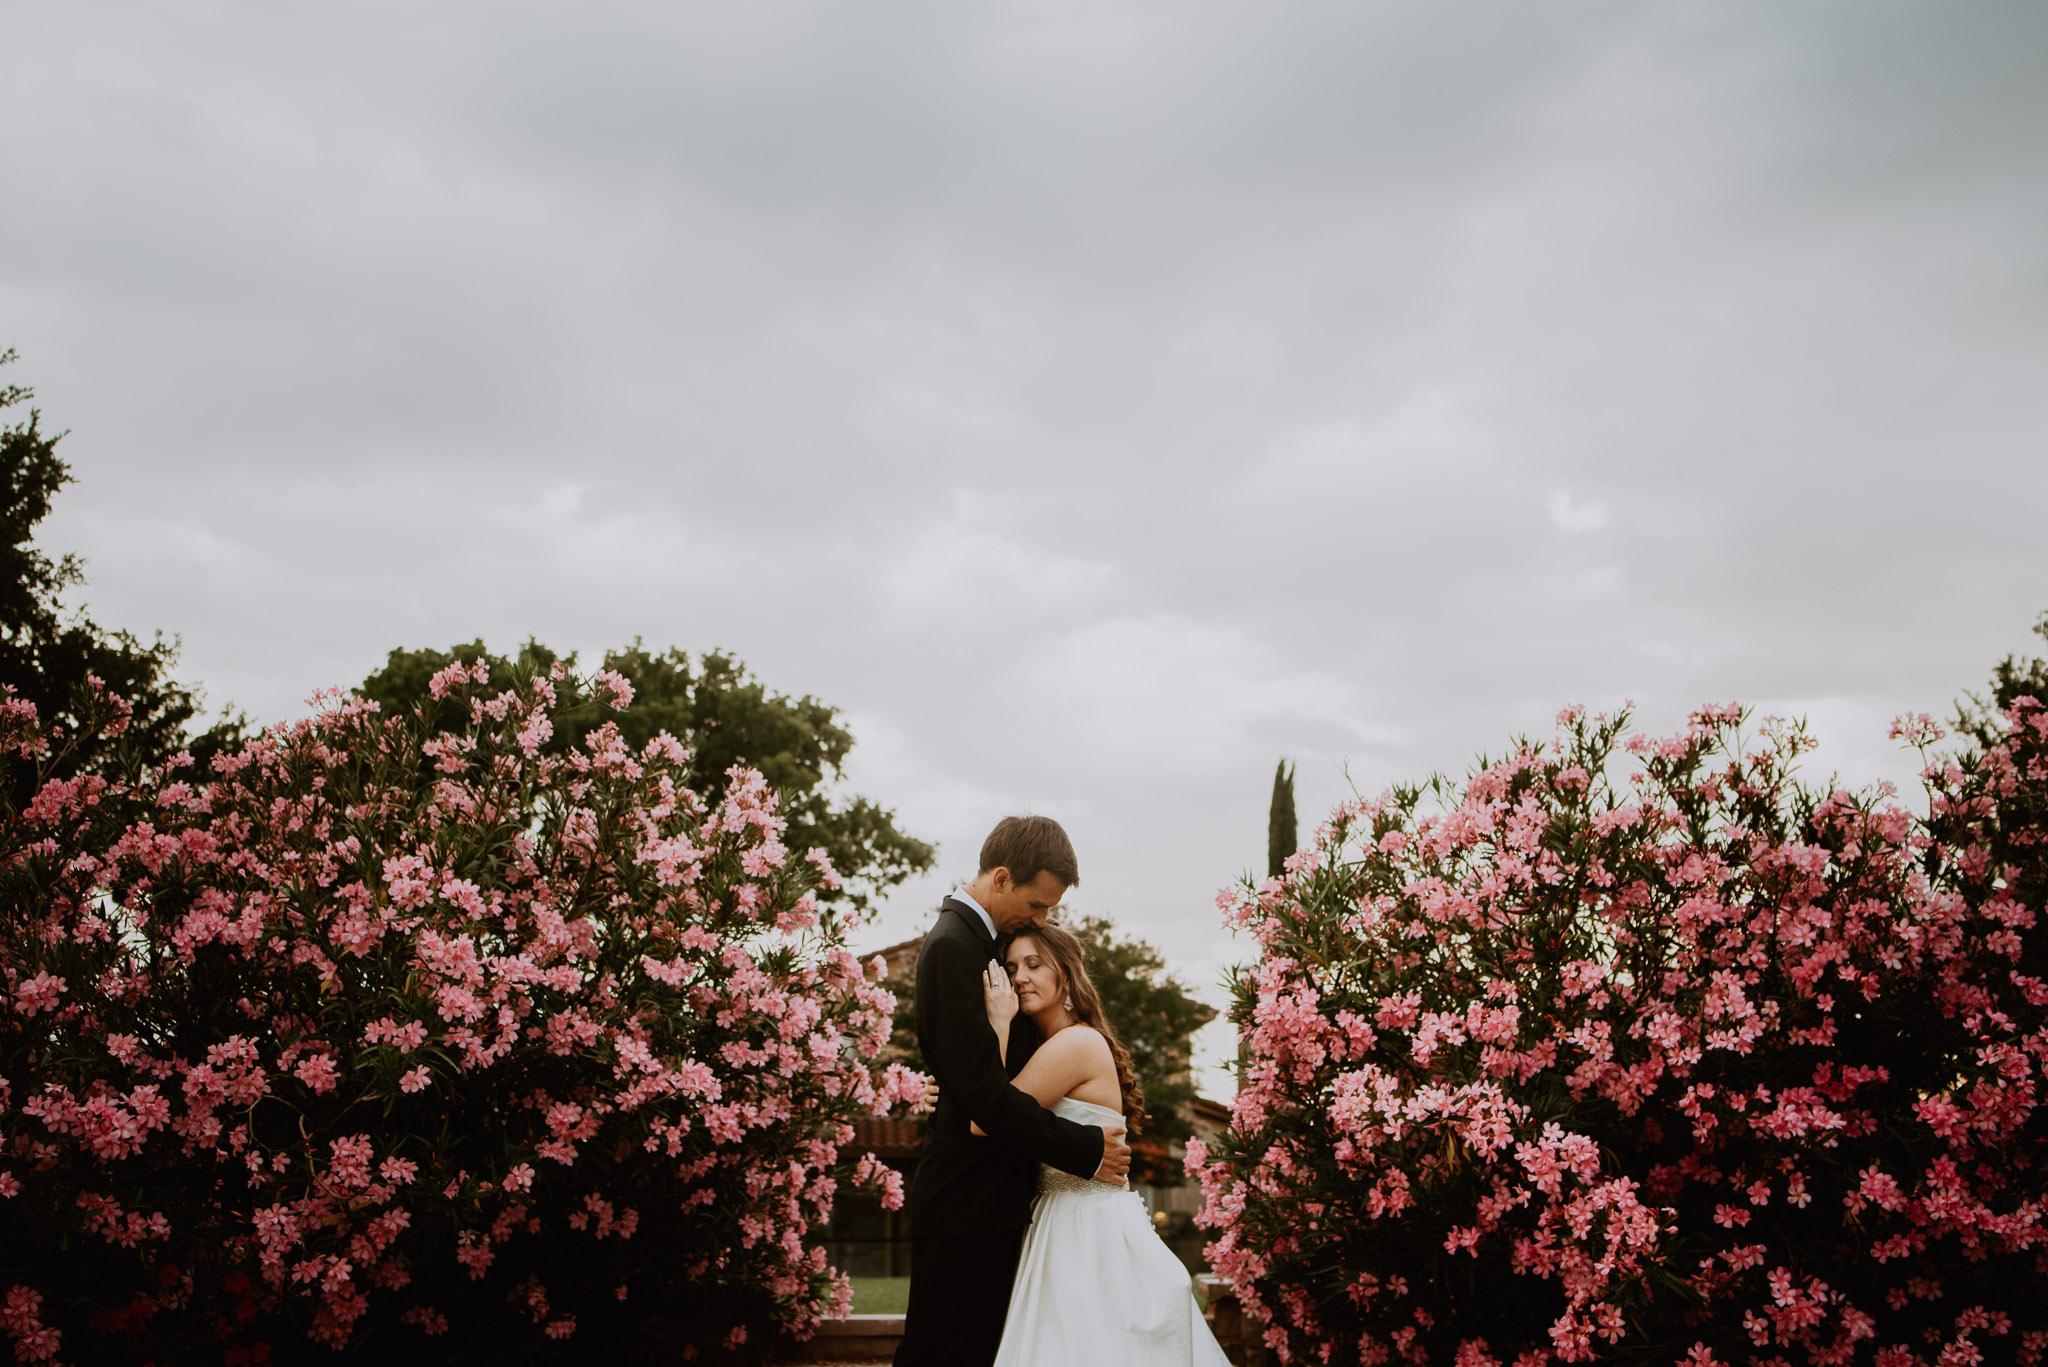 Bentwood-country-club-wedding-shea-tyson-0025.jpg